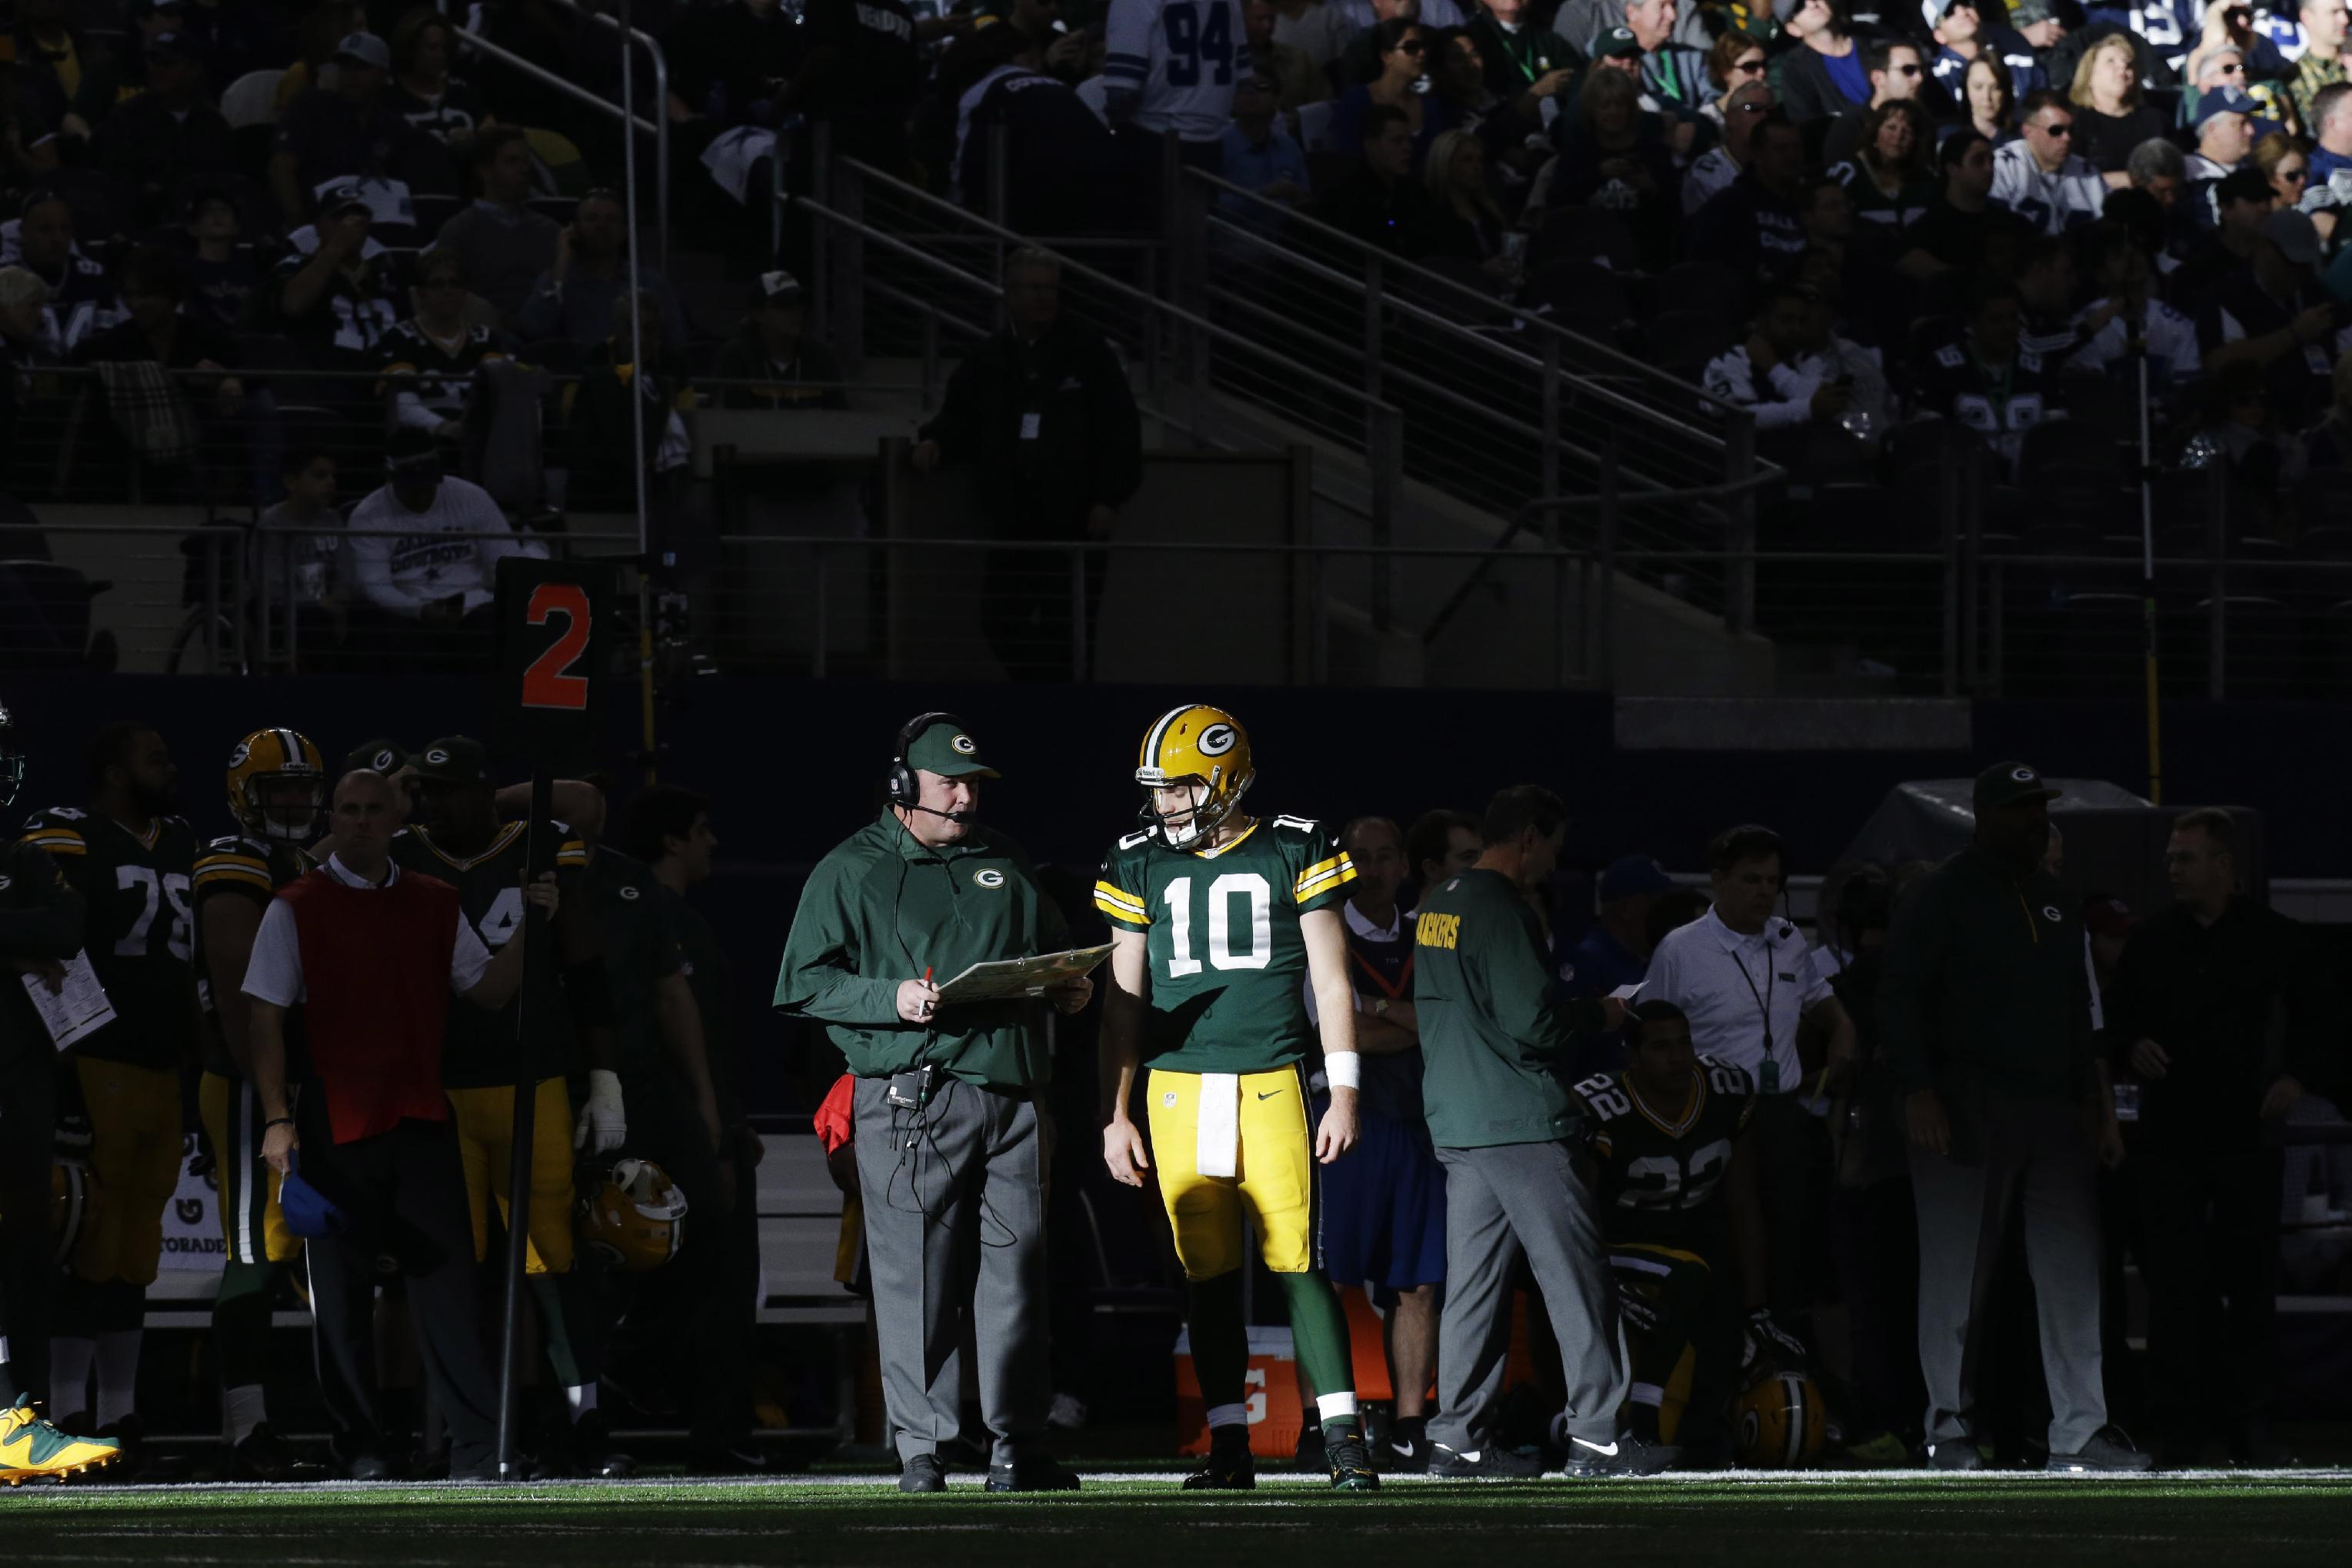 Green Bay Packers quarterback Matt Flynn (10) talks with head coach Mike McCarthy during the first half of an NFL football game against the Dallas Cowboys, Sunday, Dec. 15, 2013, in Arlington, Texas